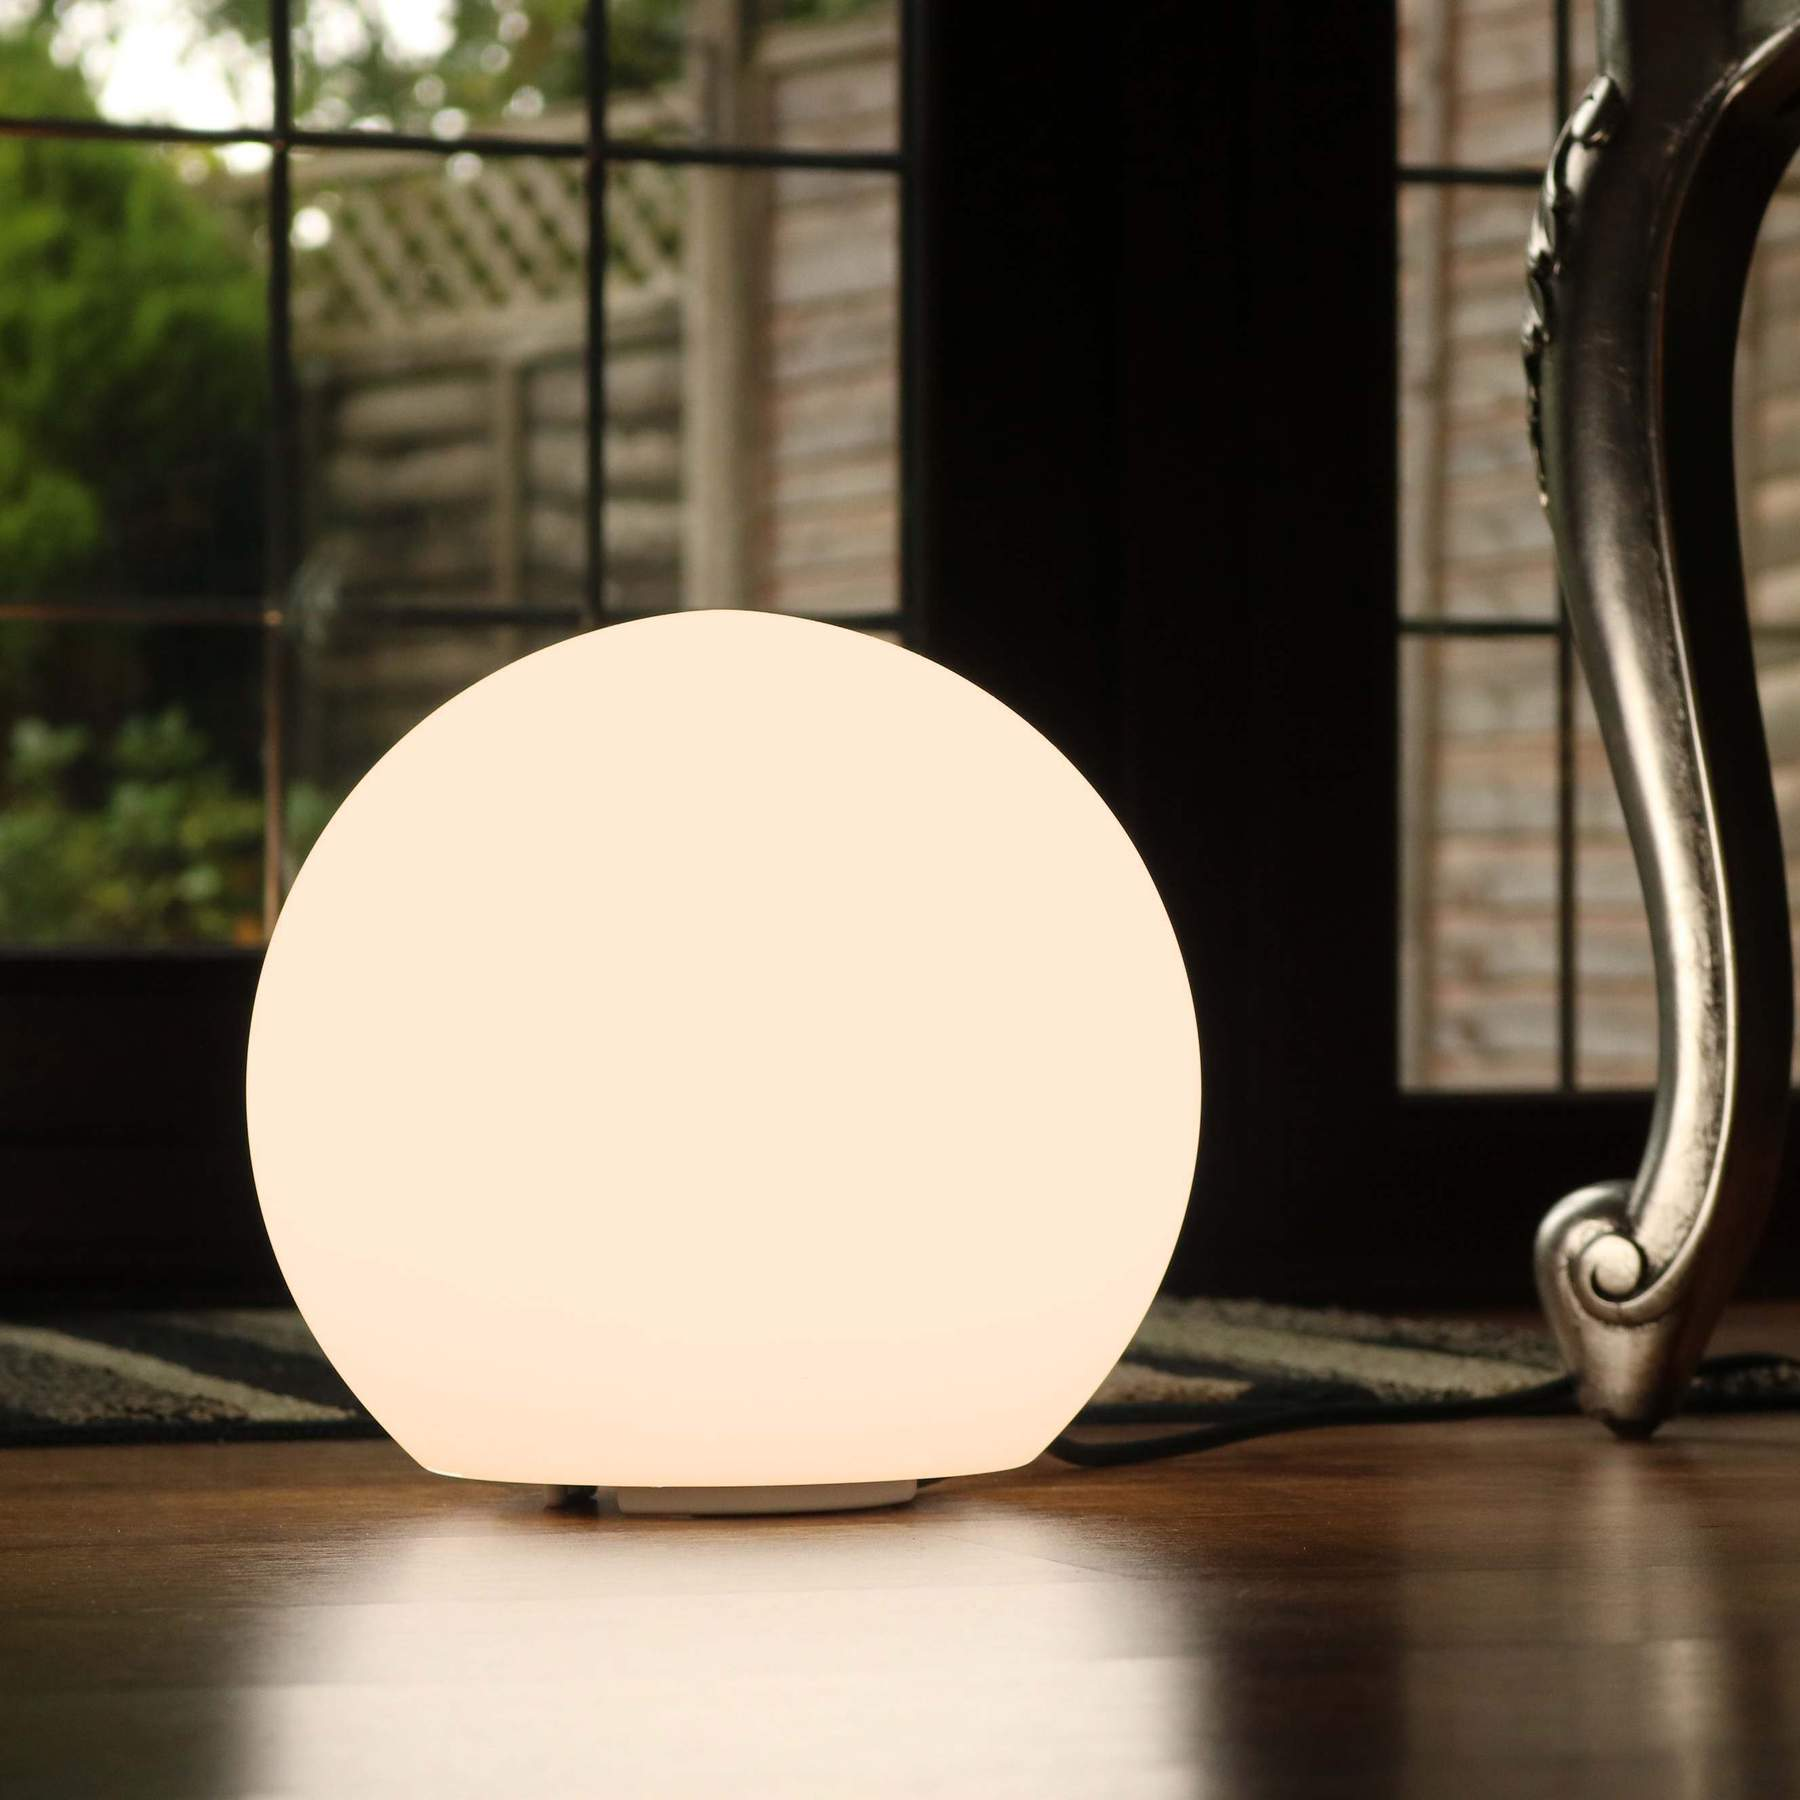 20 cm E27 Bulb lighting Balls, 7.9 inch Customized LED Balls, Personalized logo Sphere Lamps